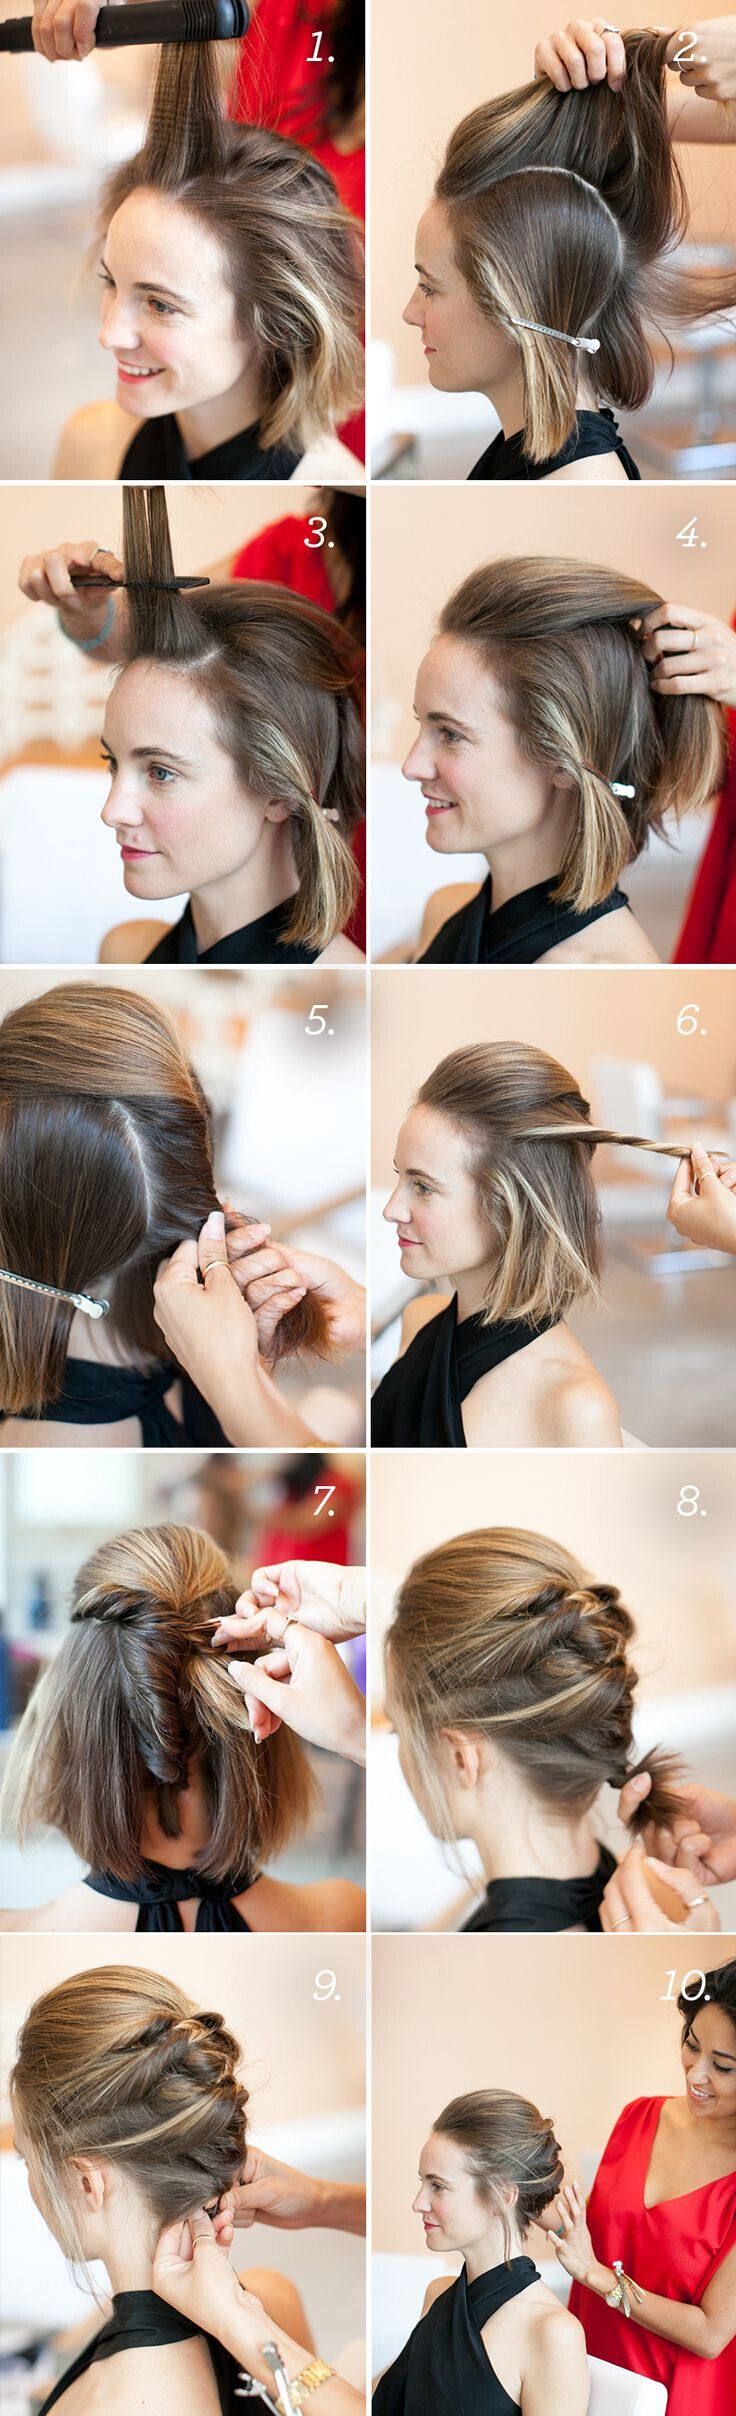 Wondrous 5 Easy To Follow Short Hair Tutorials Hair Reader39S Digest Hairstyles For Women Draintrainus